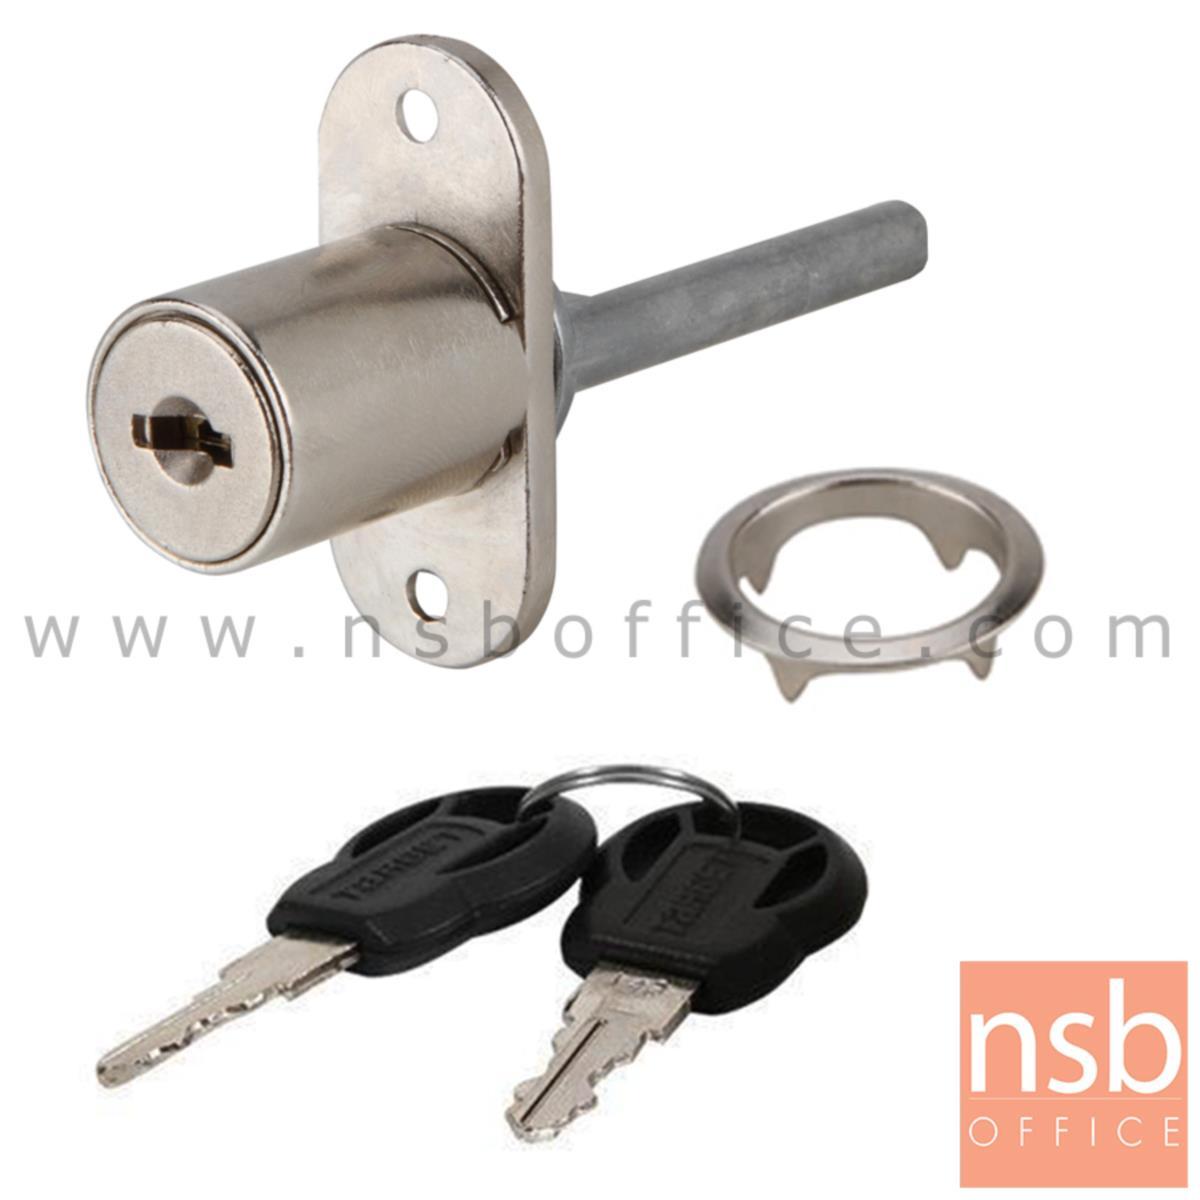 J01A019:กุญแจล็อกลิ้นชัก รุ่น Hudson (ฮัดสัน)